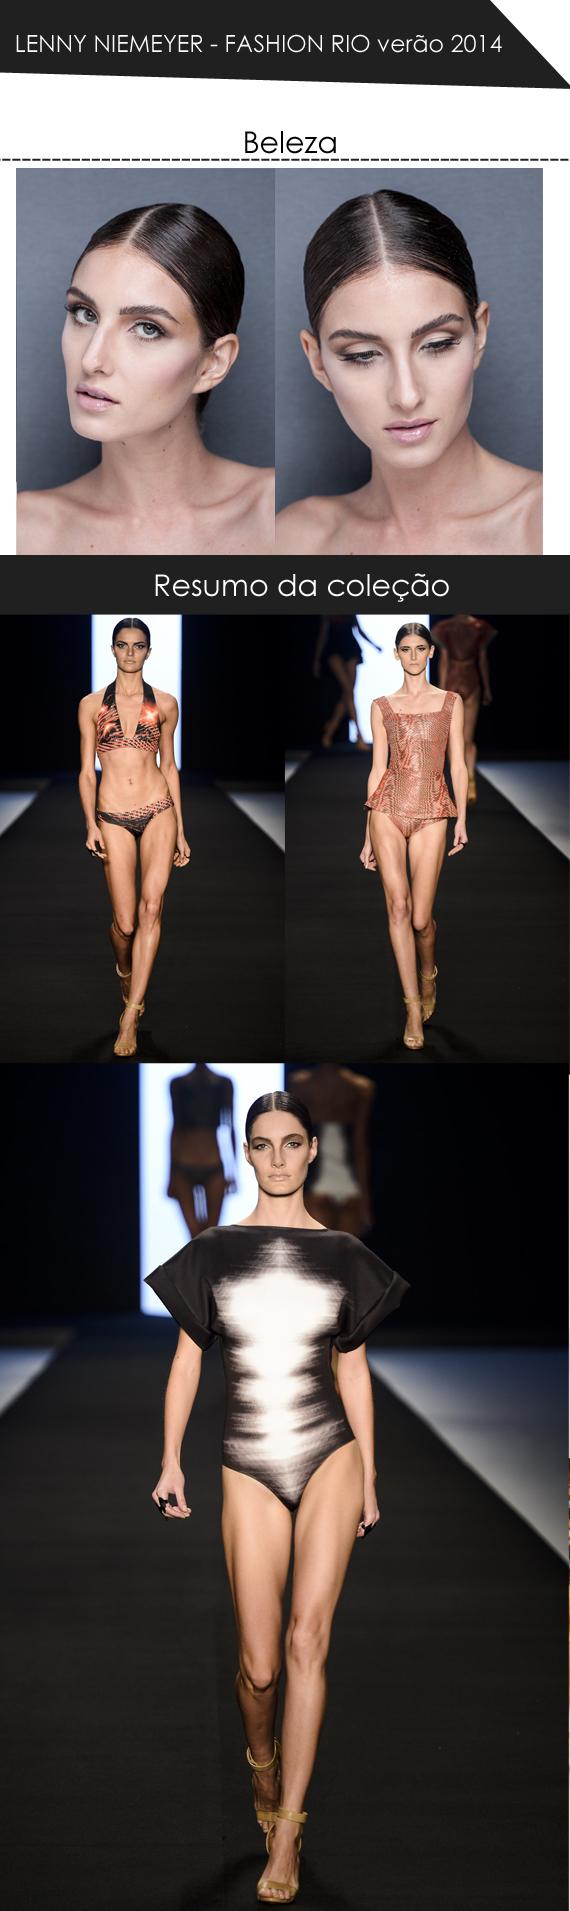 LENNY NIEMEYER  fashion rio verão 2014 por Mean Fashion